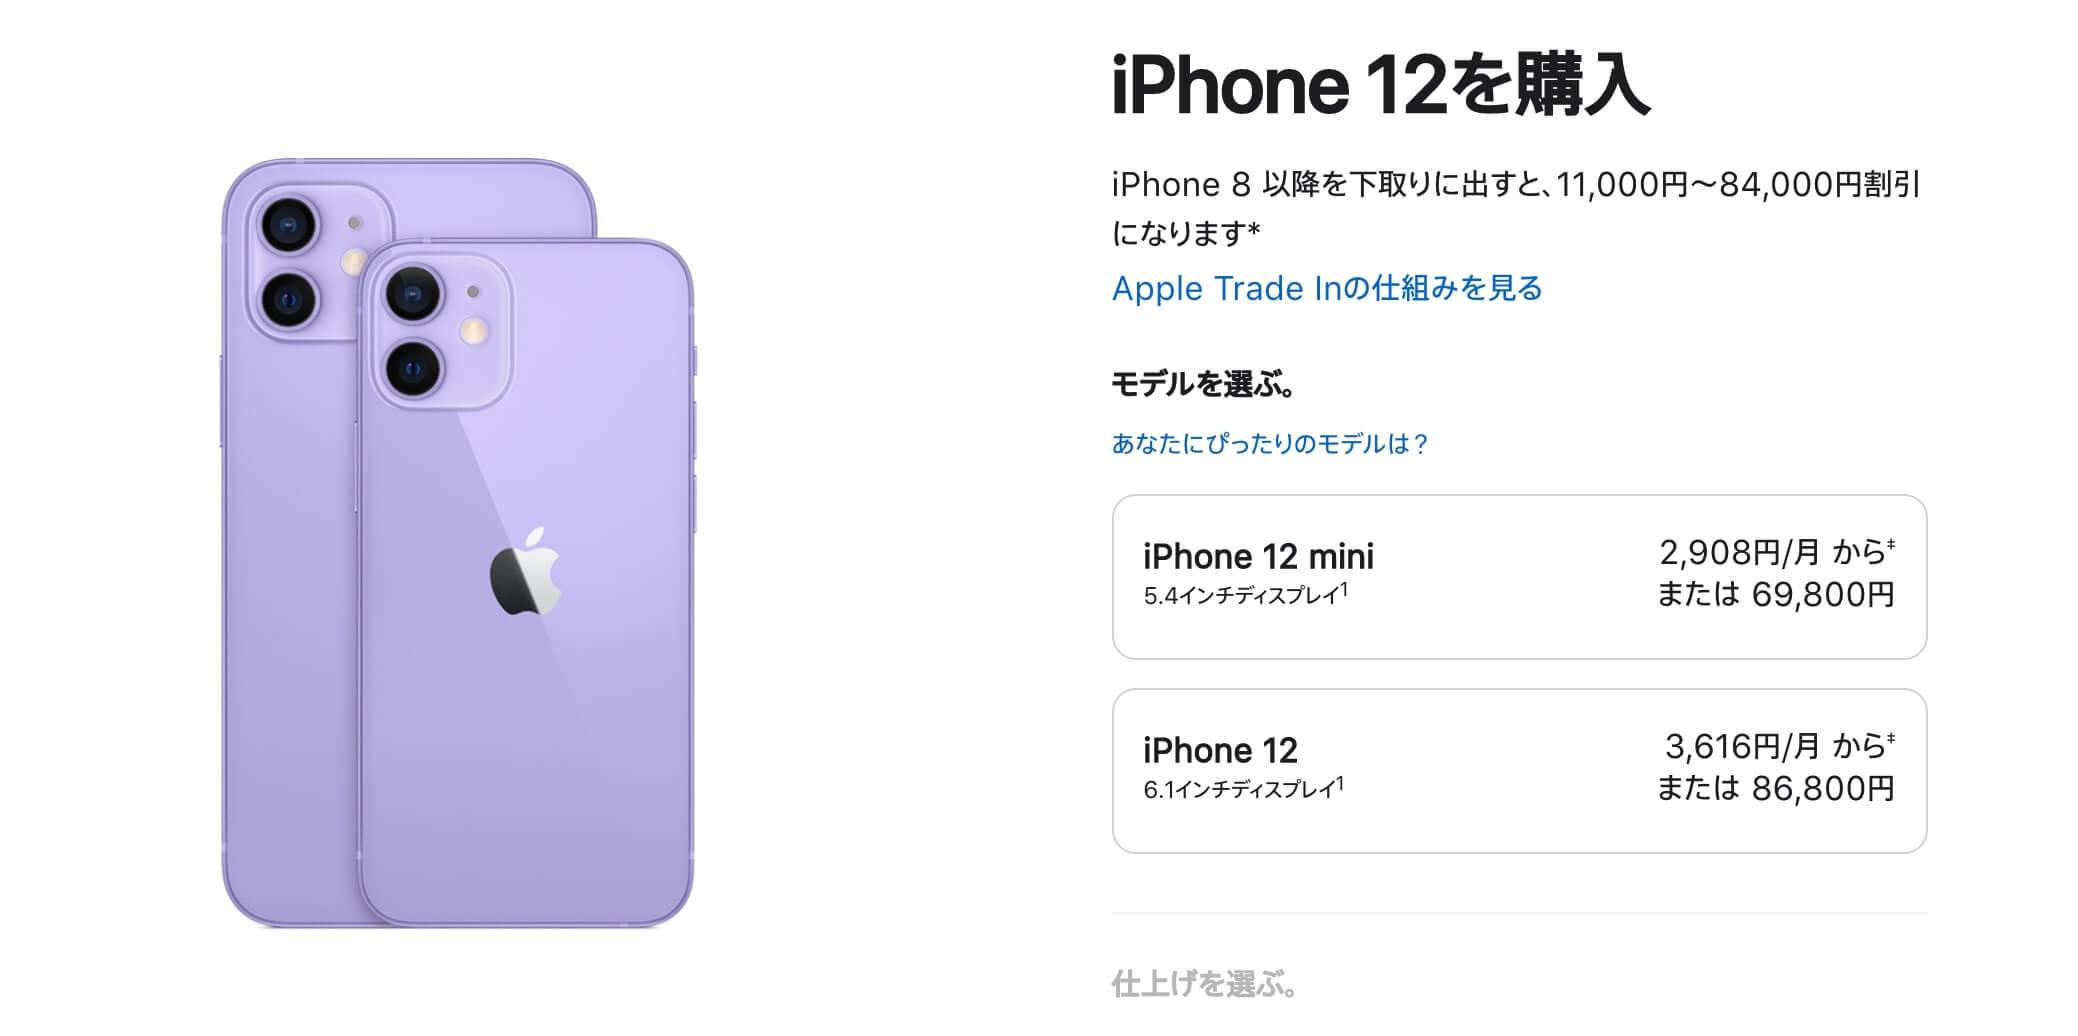 AppleストアのiPhone 12(mini・Pro・Max)の値下げいつ 時期